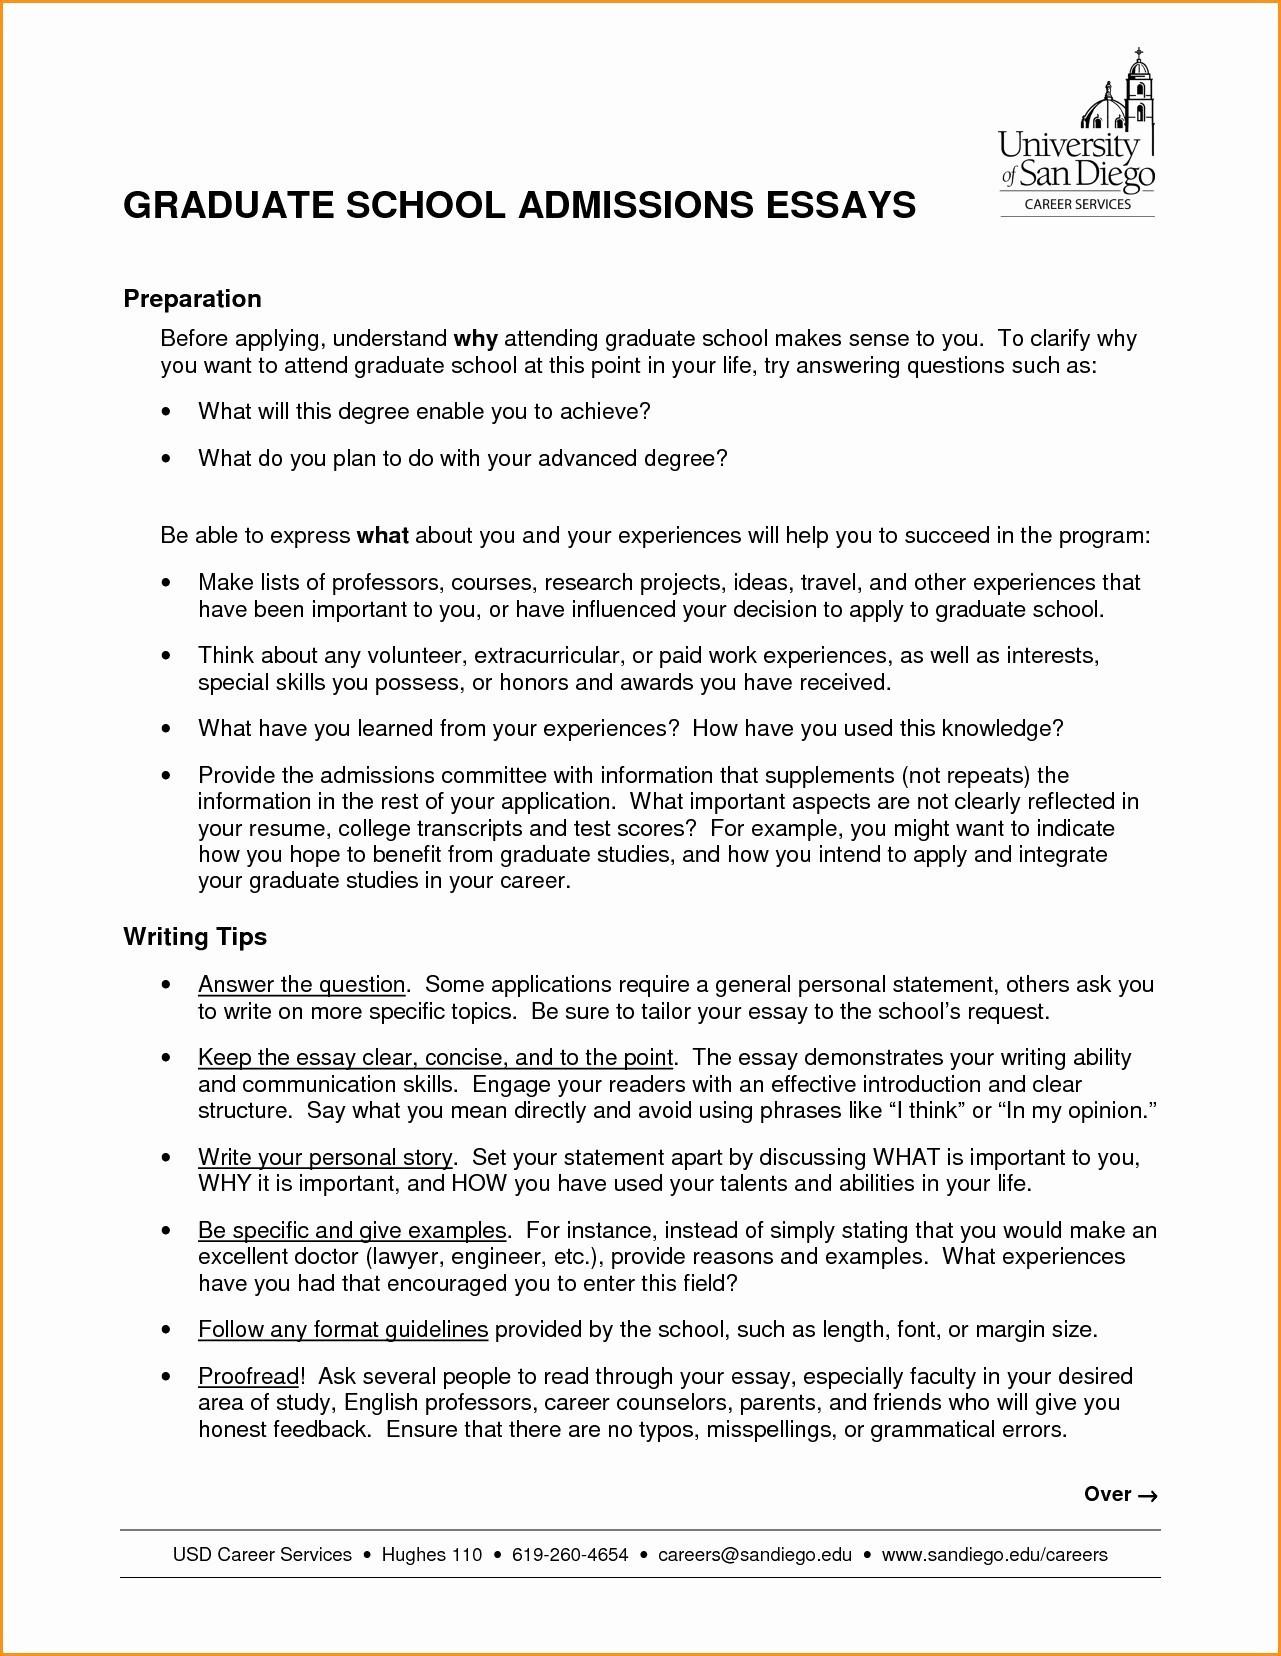 Nursing School Recommendation Letter Template - Literarywondrous Grad School Re Mendation Letter Sample